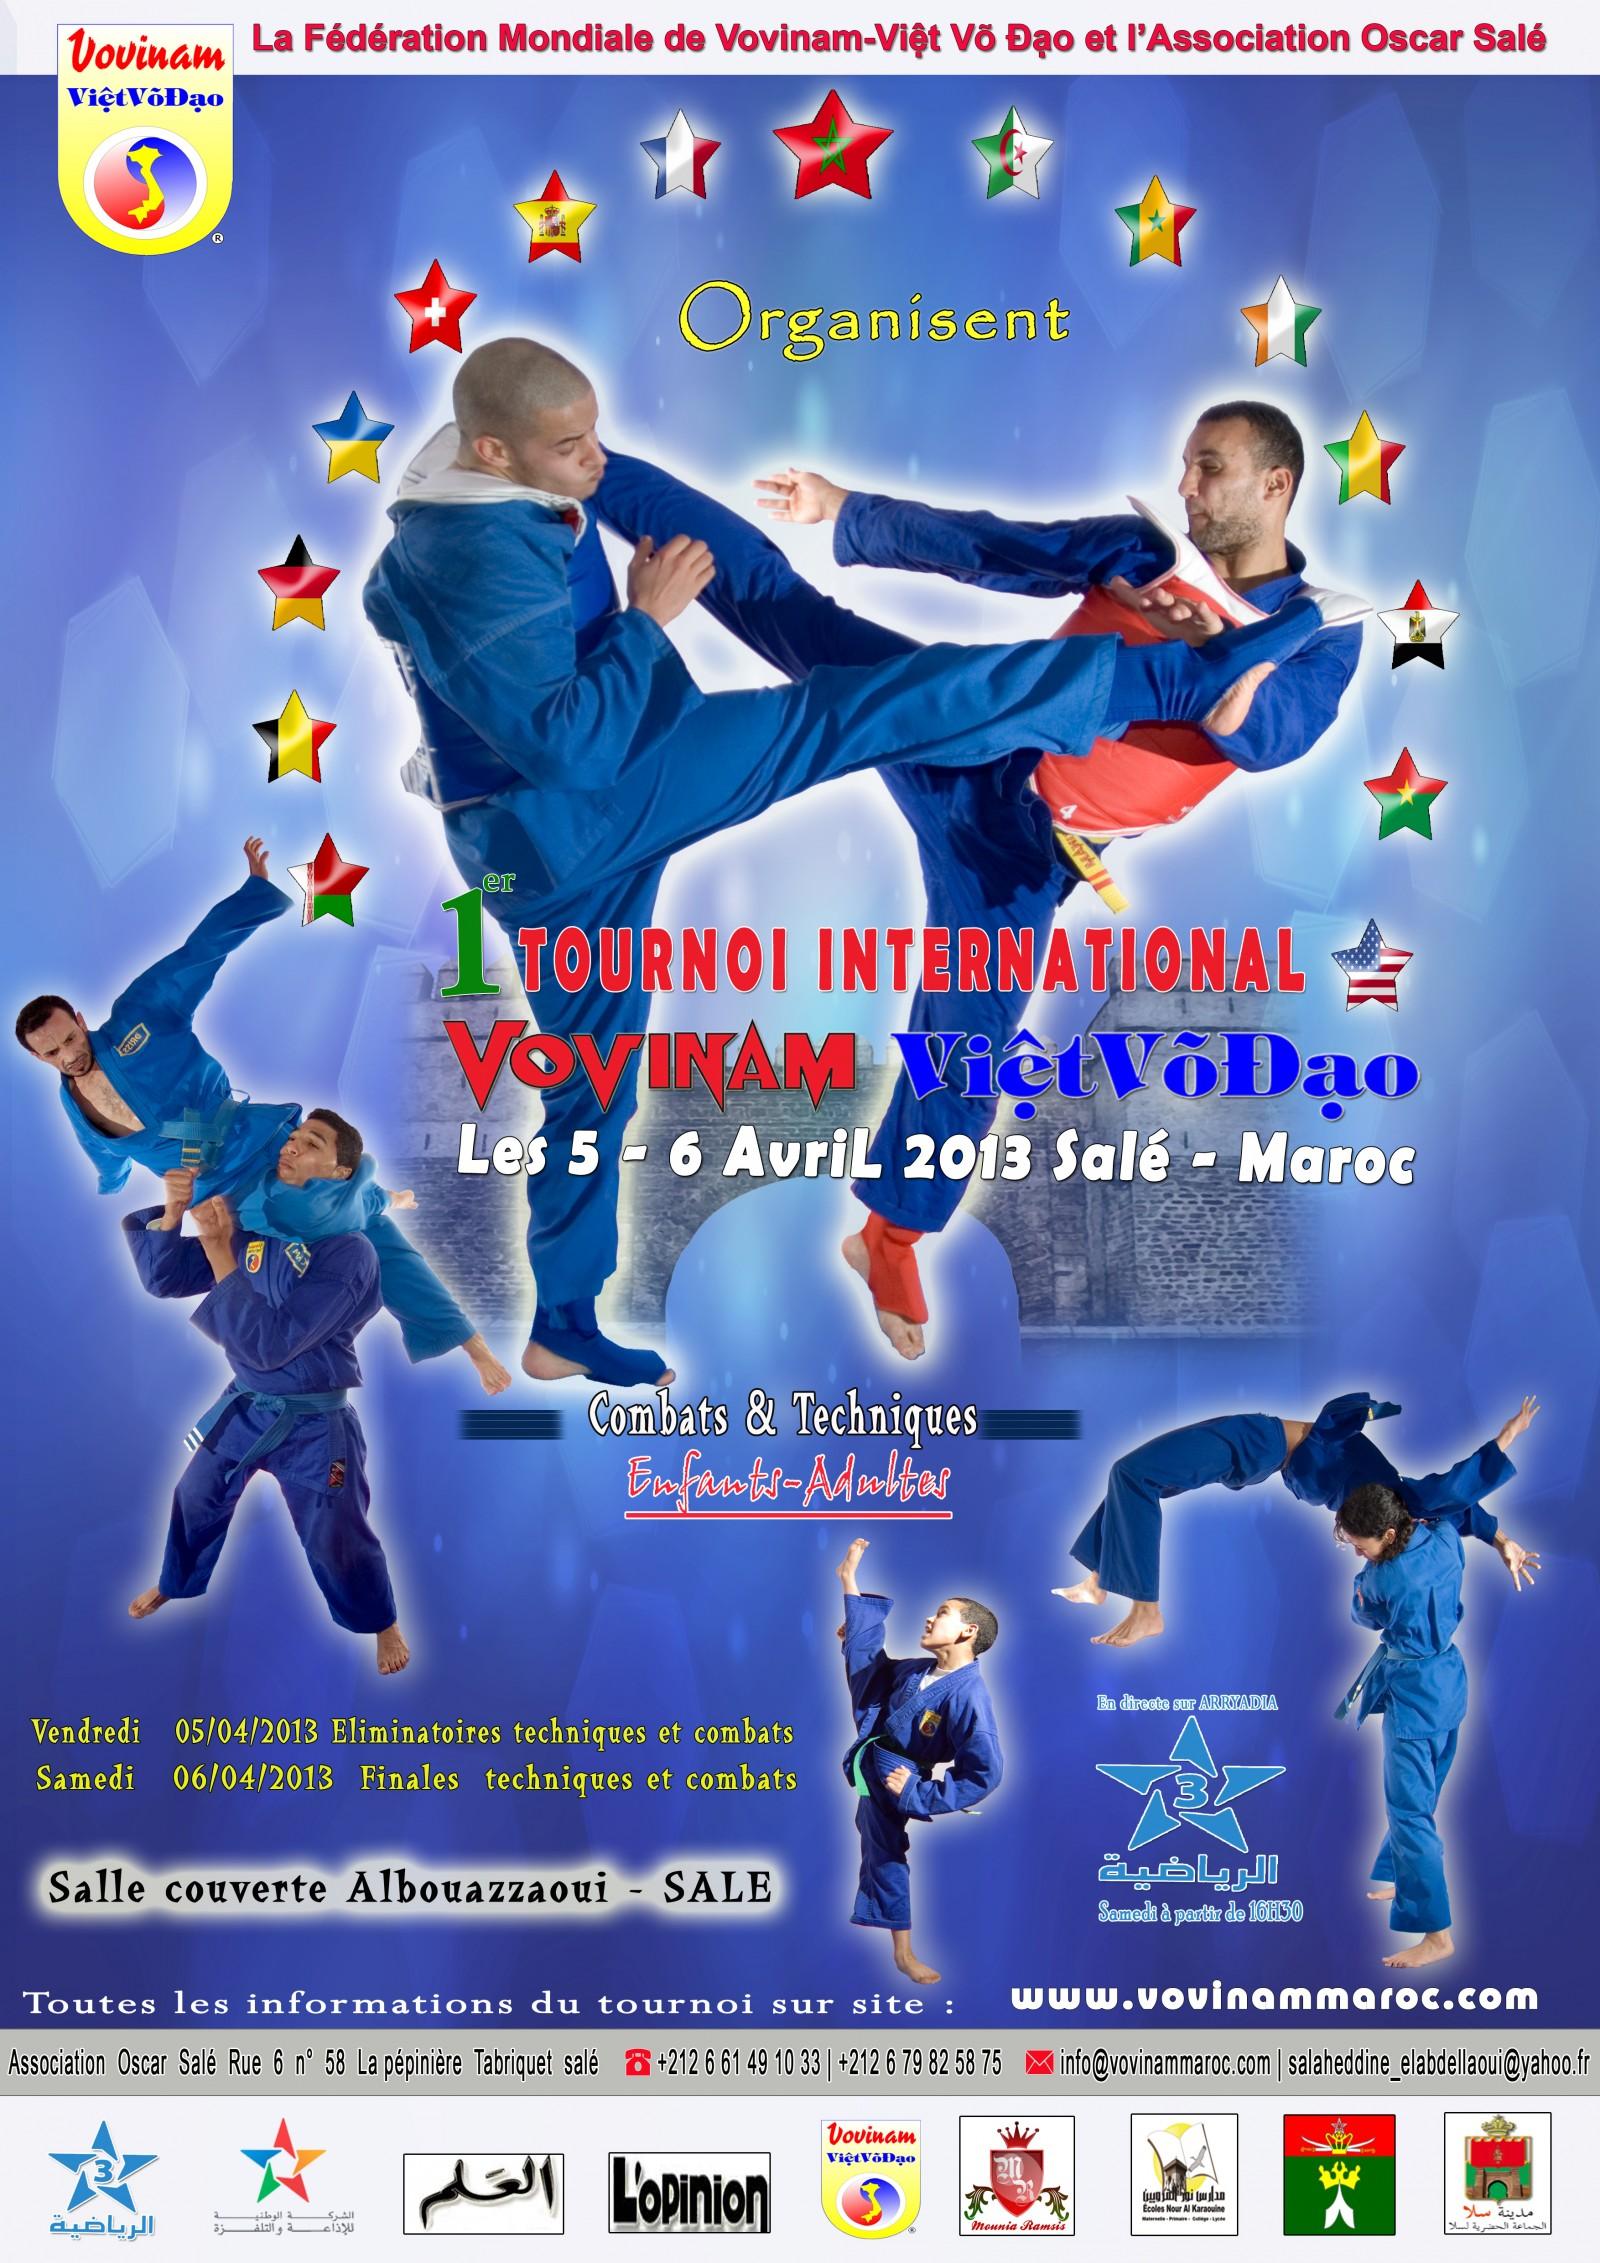 Tournoi international_maroc2013